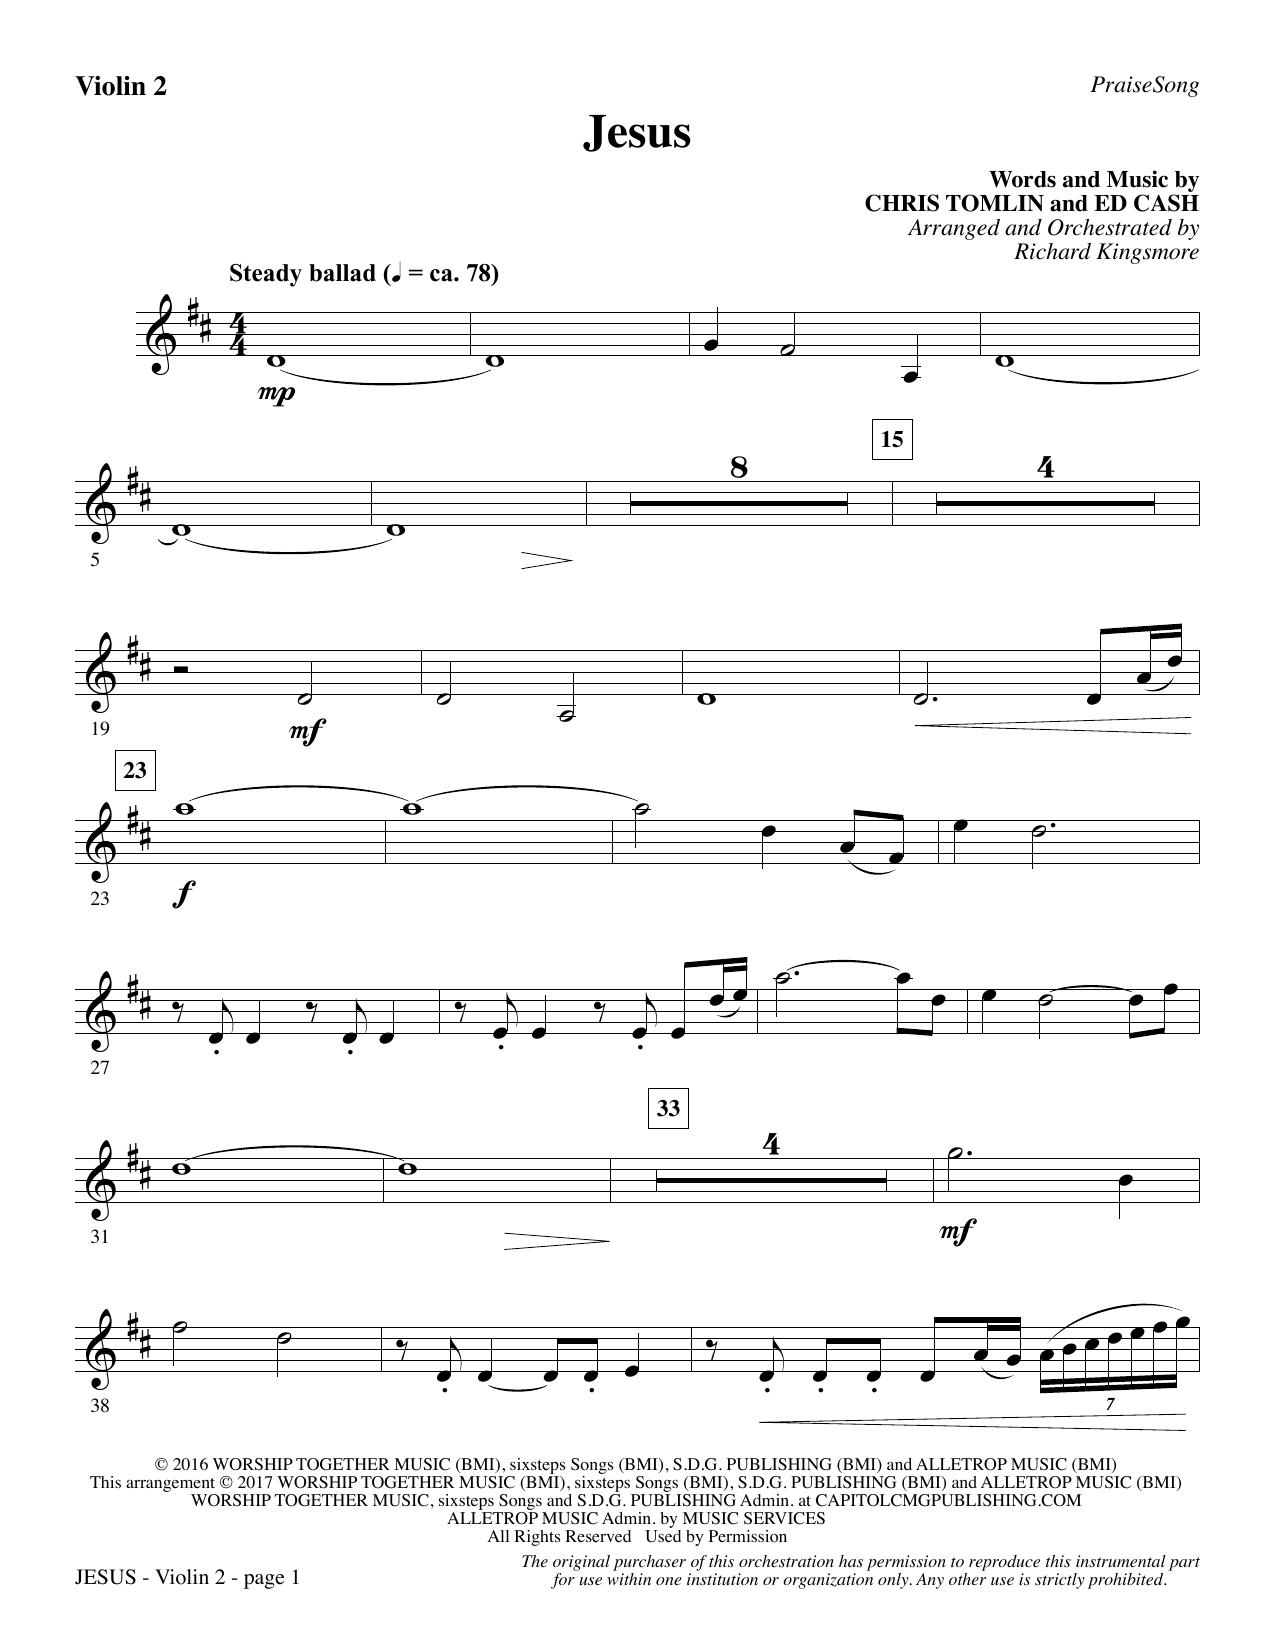 Jesus - Violin 2